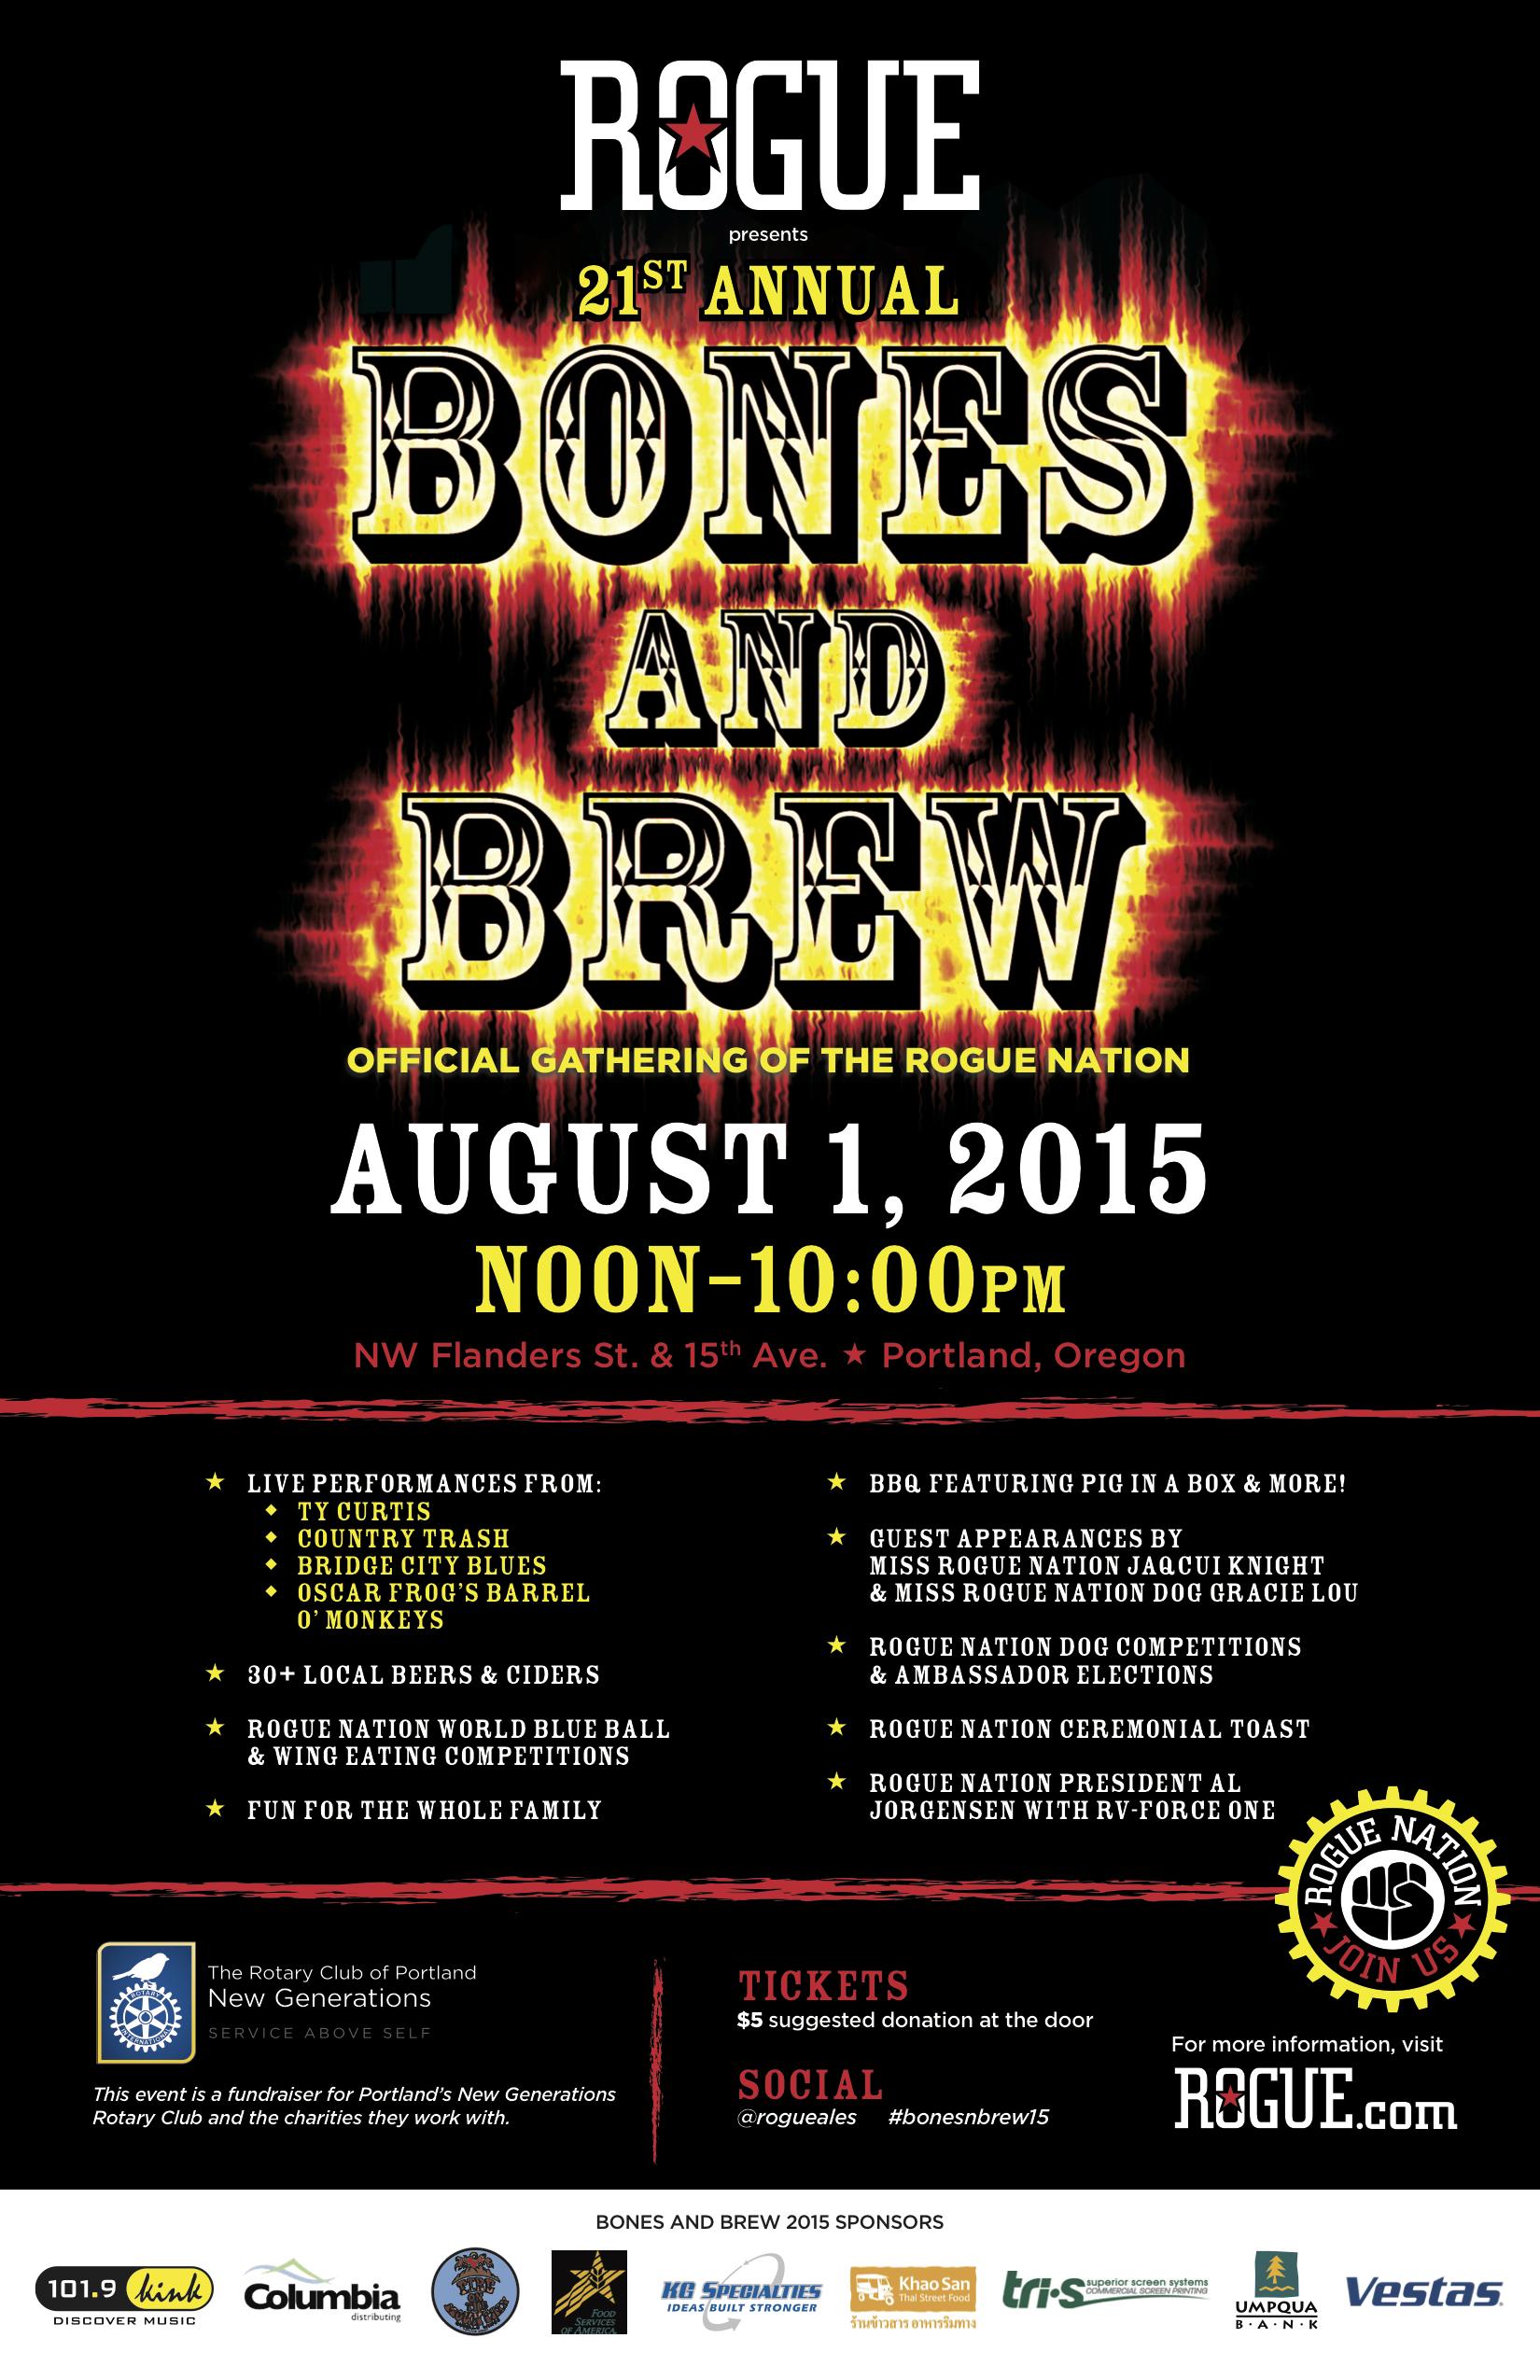 Rogue 21st Annual Bones & Brew